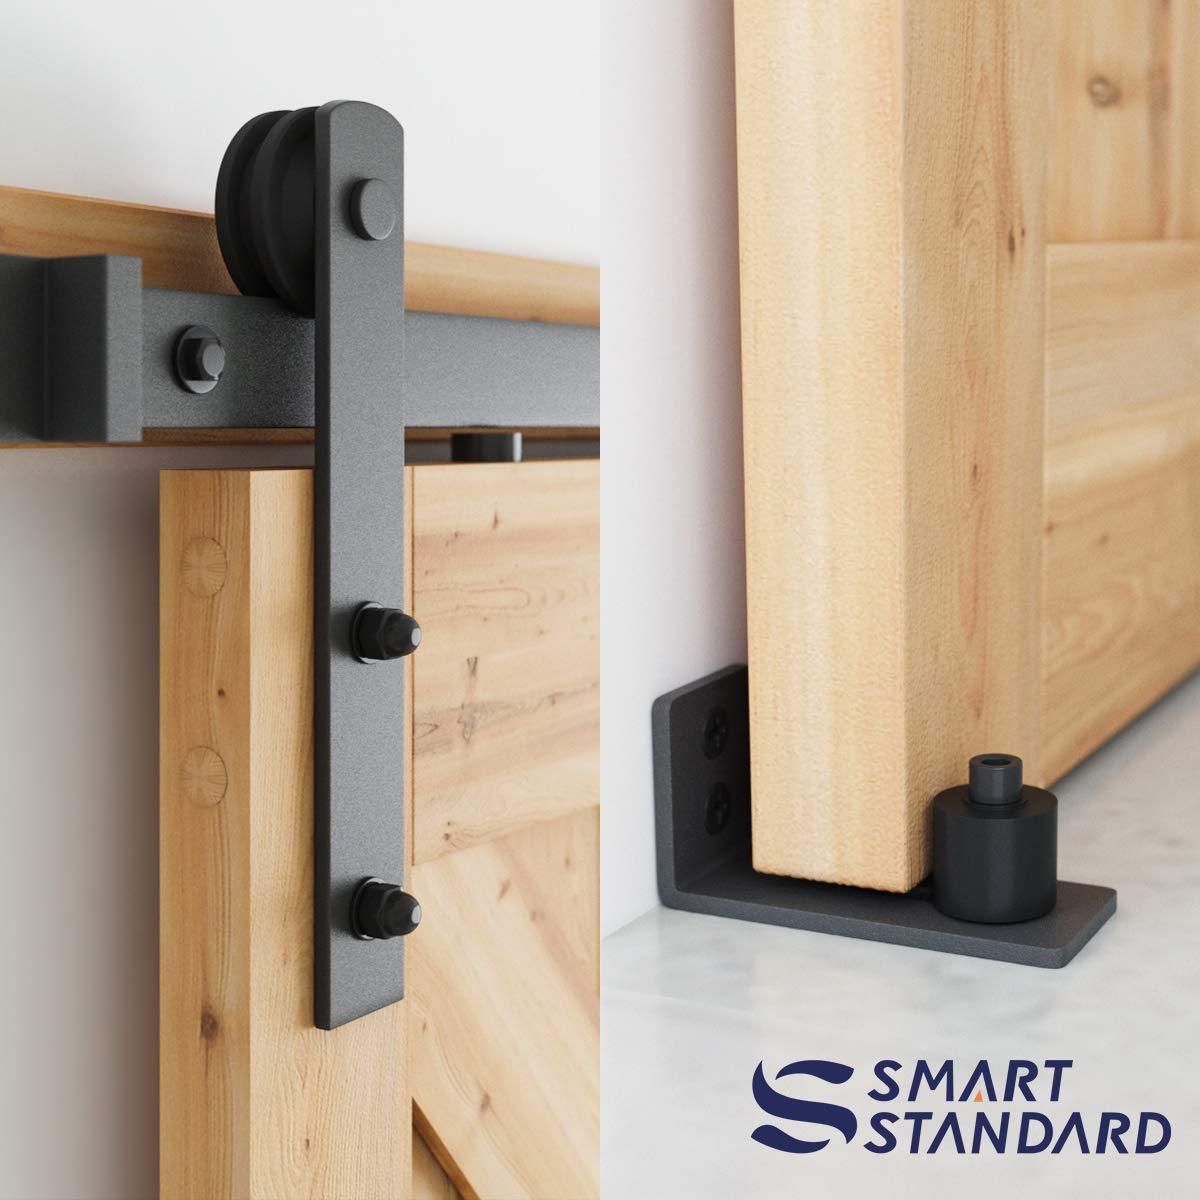 6.6 FT Heavy Duty Sturdy Sliding Barn Door Hardware Kit, 6.6ft Double Rail, Black, (Whole Set Includes 1x Pull Handle Set & 1x Floor Guide & 1x Latch Lock) Fit 36''-40'' Wide Door Panel (I Shape Hanger) by SMARTSTANDARD (Image #3)